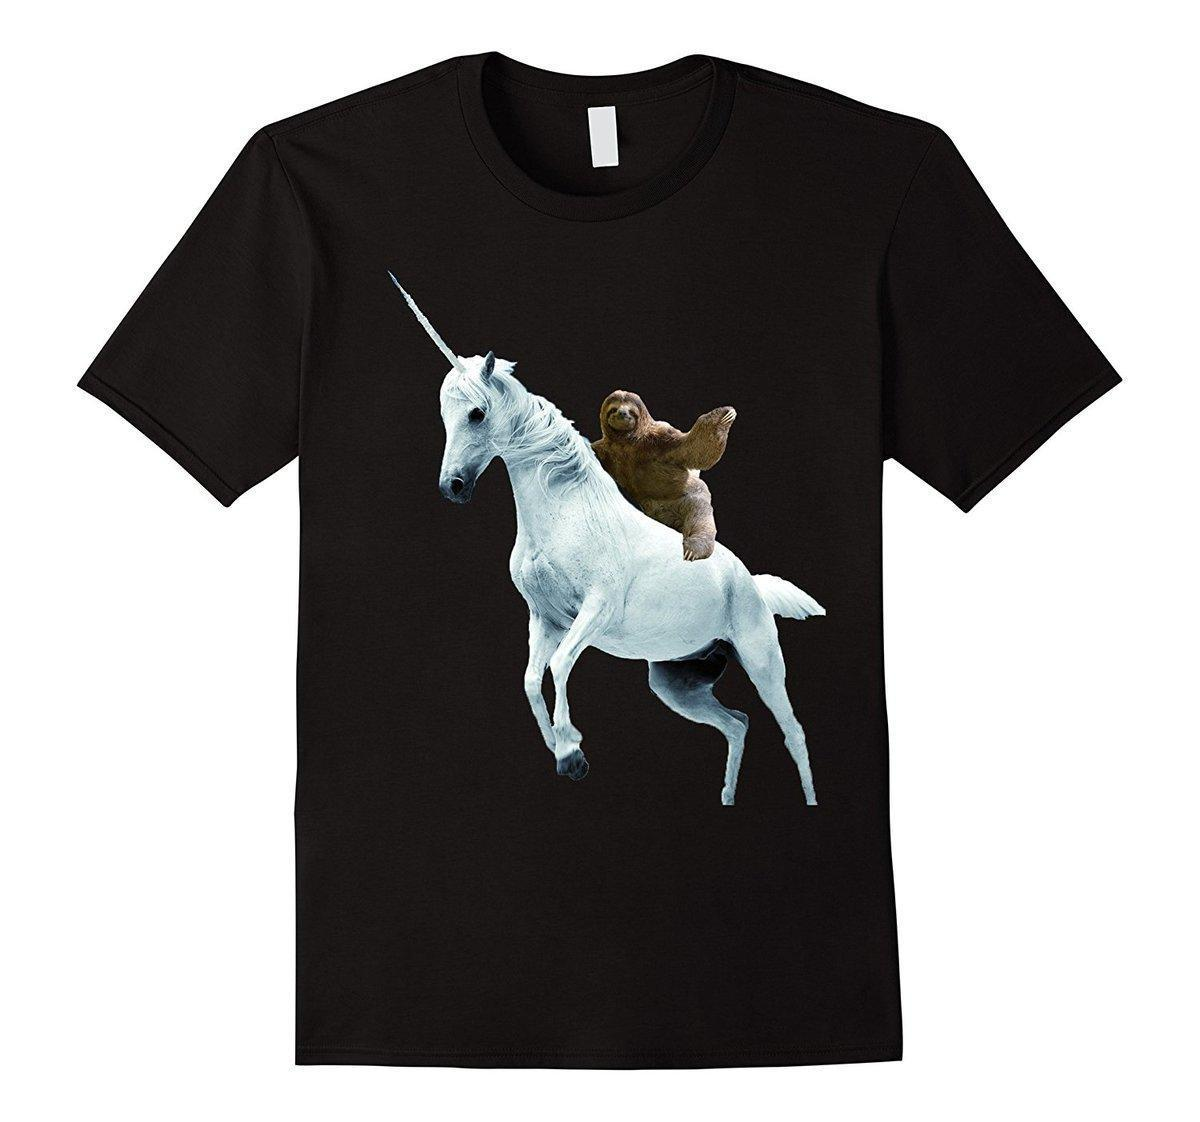 5ff0ecb6d2a0 Unicorn Sloth T Shirt Design Funny Animal Fashion T Shirt Hipster Cool Tops  Newest 2018 Fashion Stranger Things T Shirt Men Buy Tshirt Political Shirts  From ...